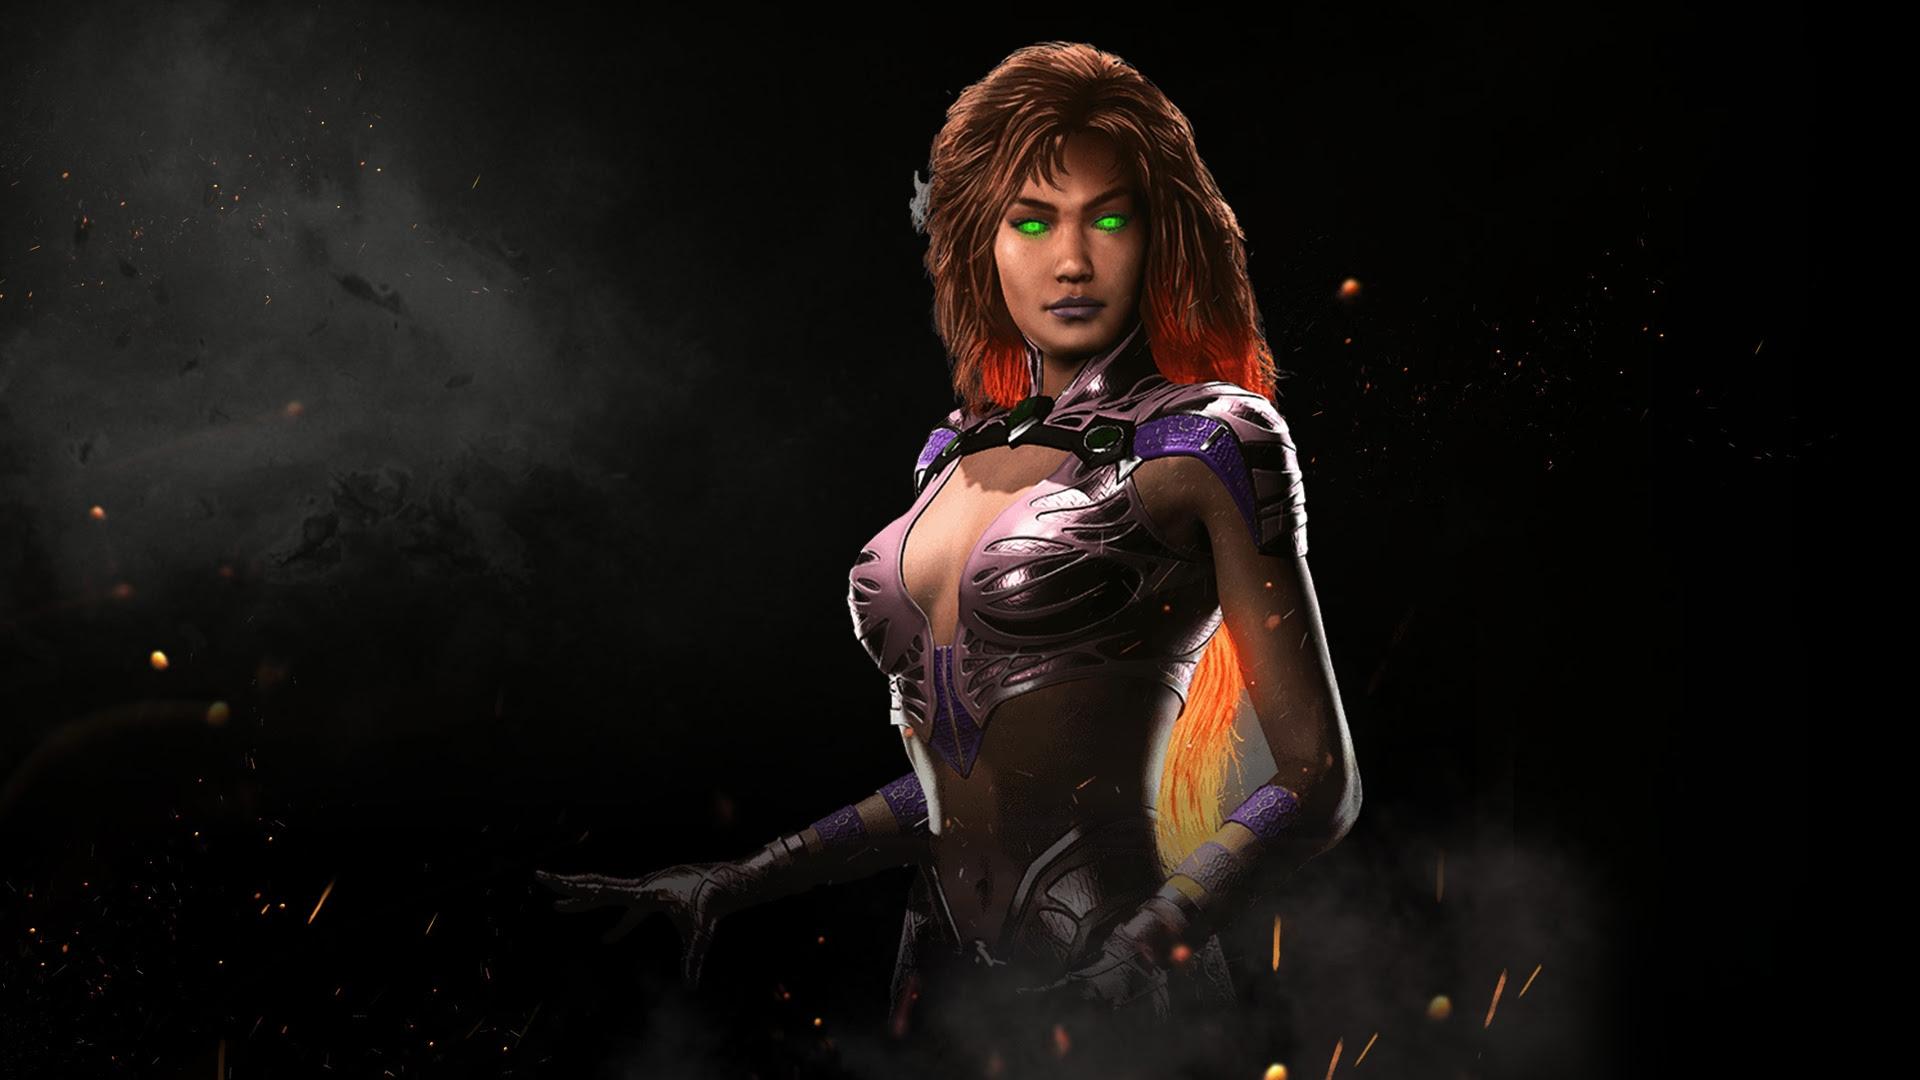 Starfire lights up the skies of Injustice 2 screenshot